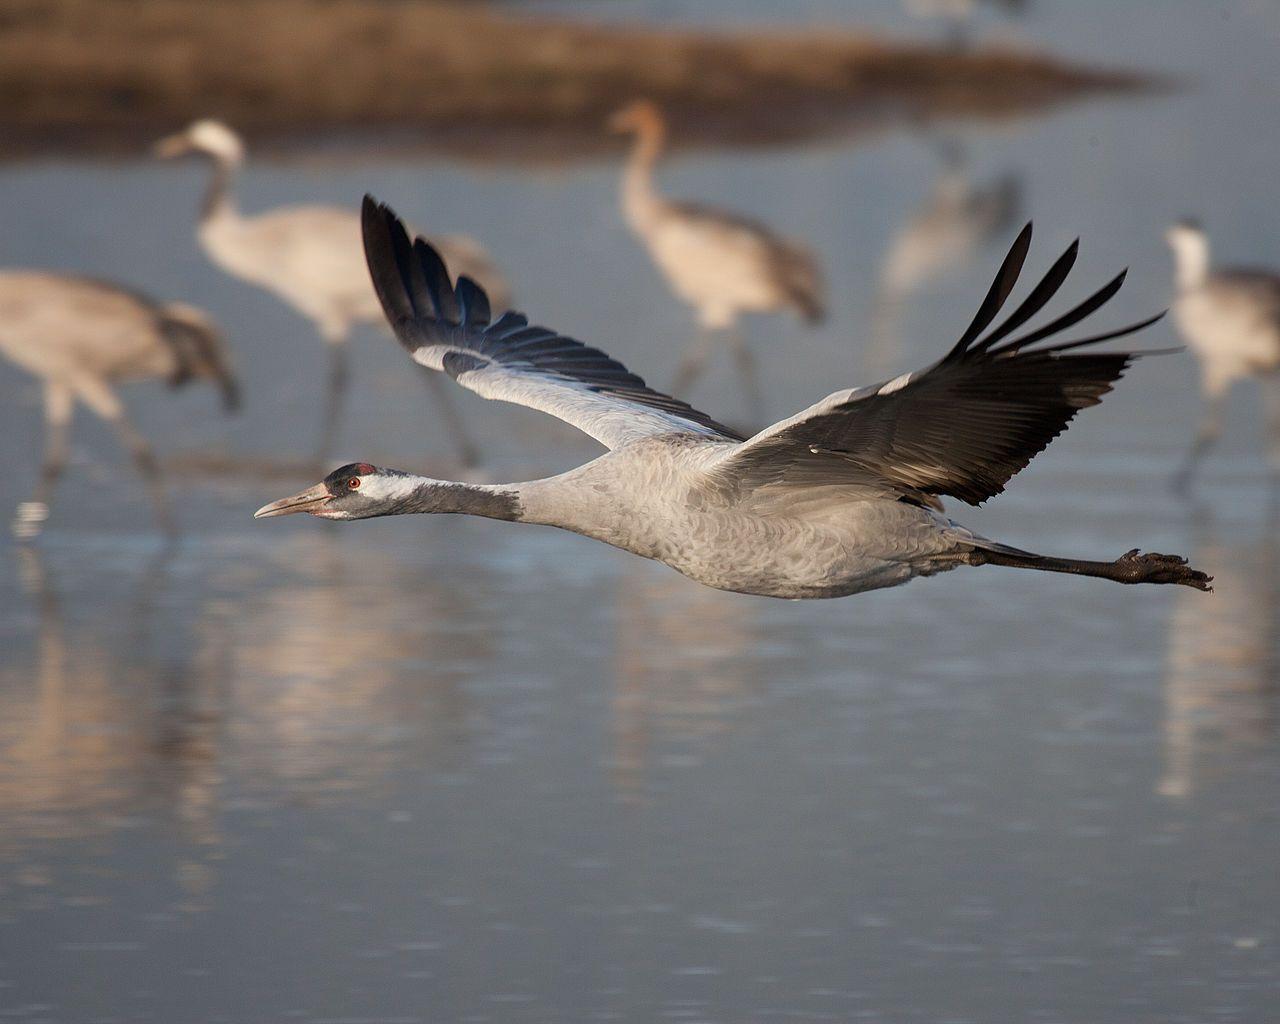 Common crane in flight at Hula valley - Серый журавль — Википедия